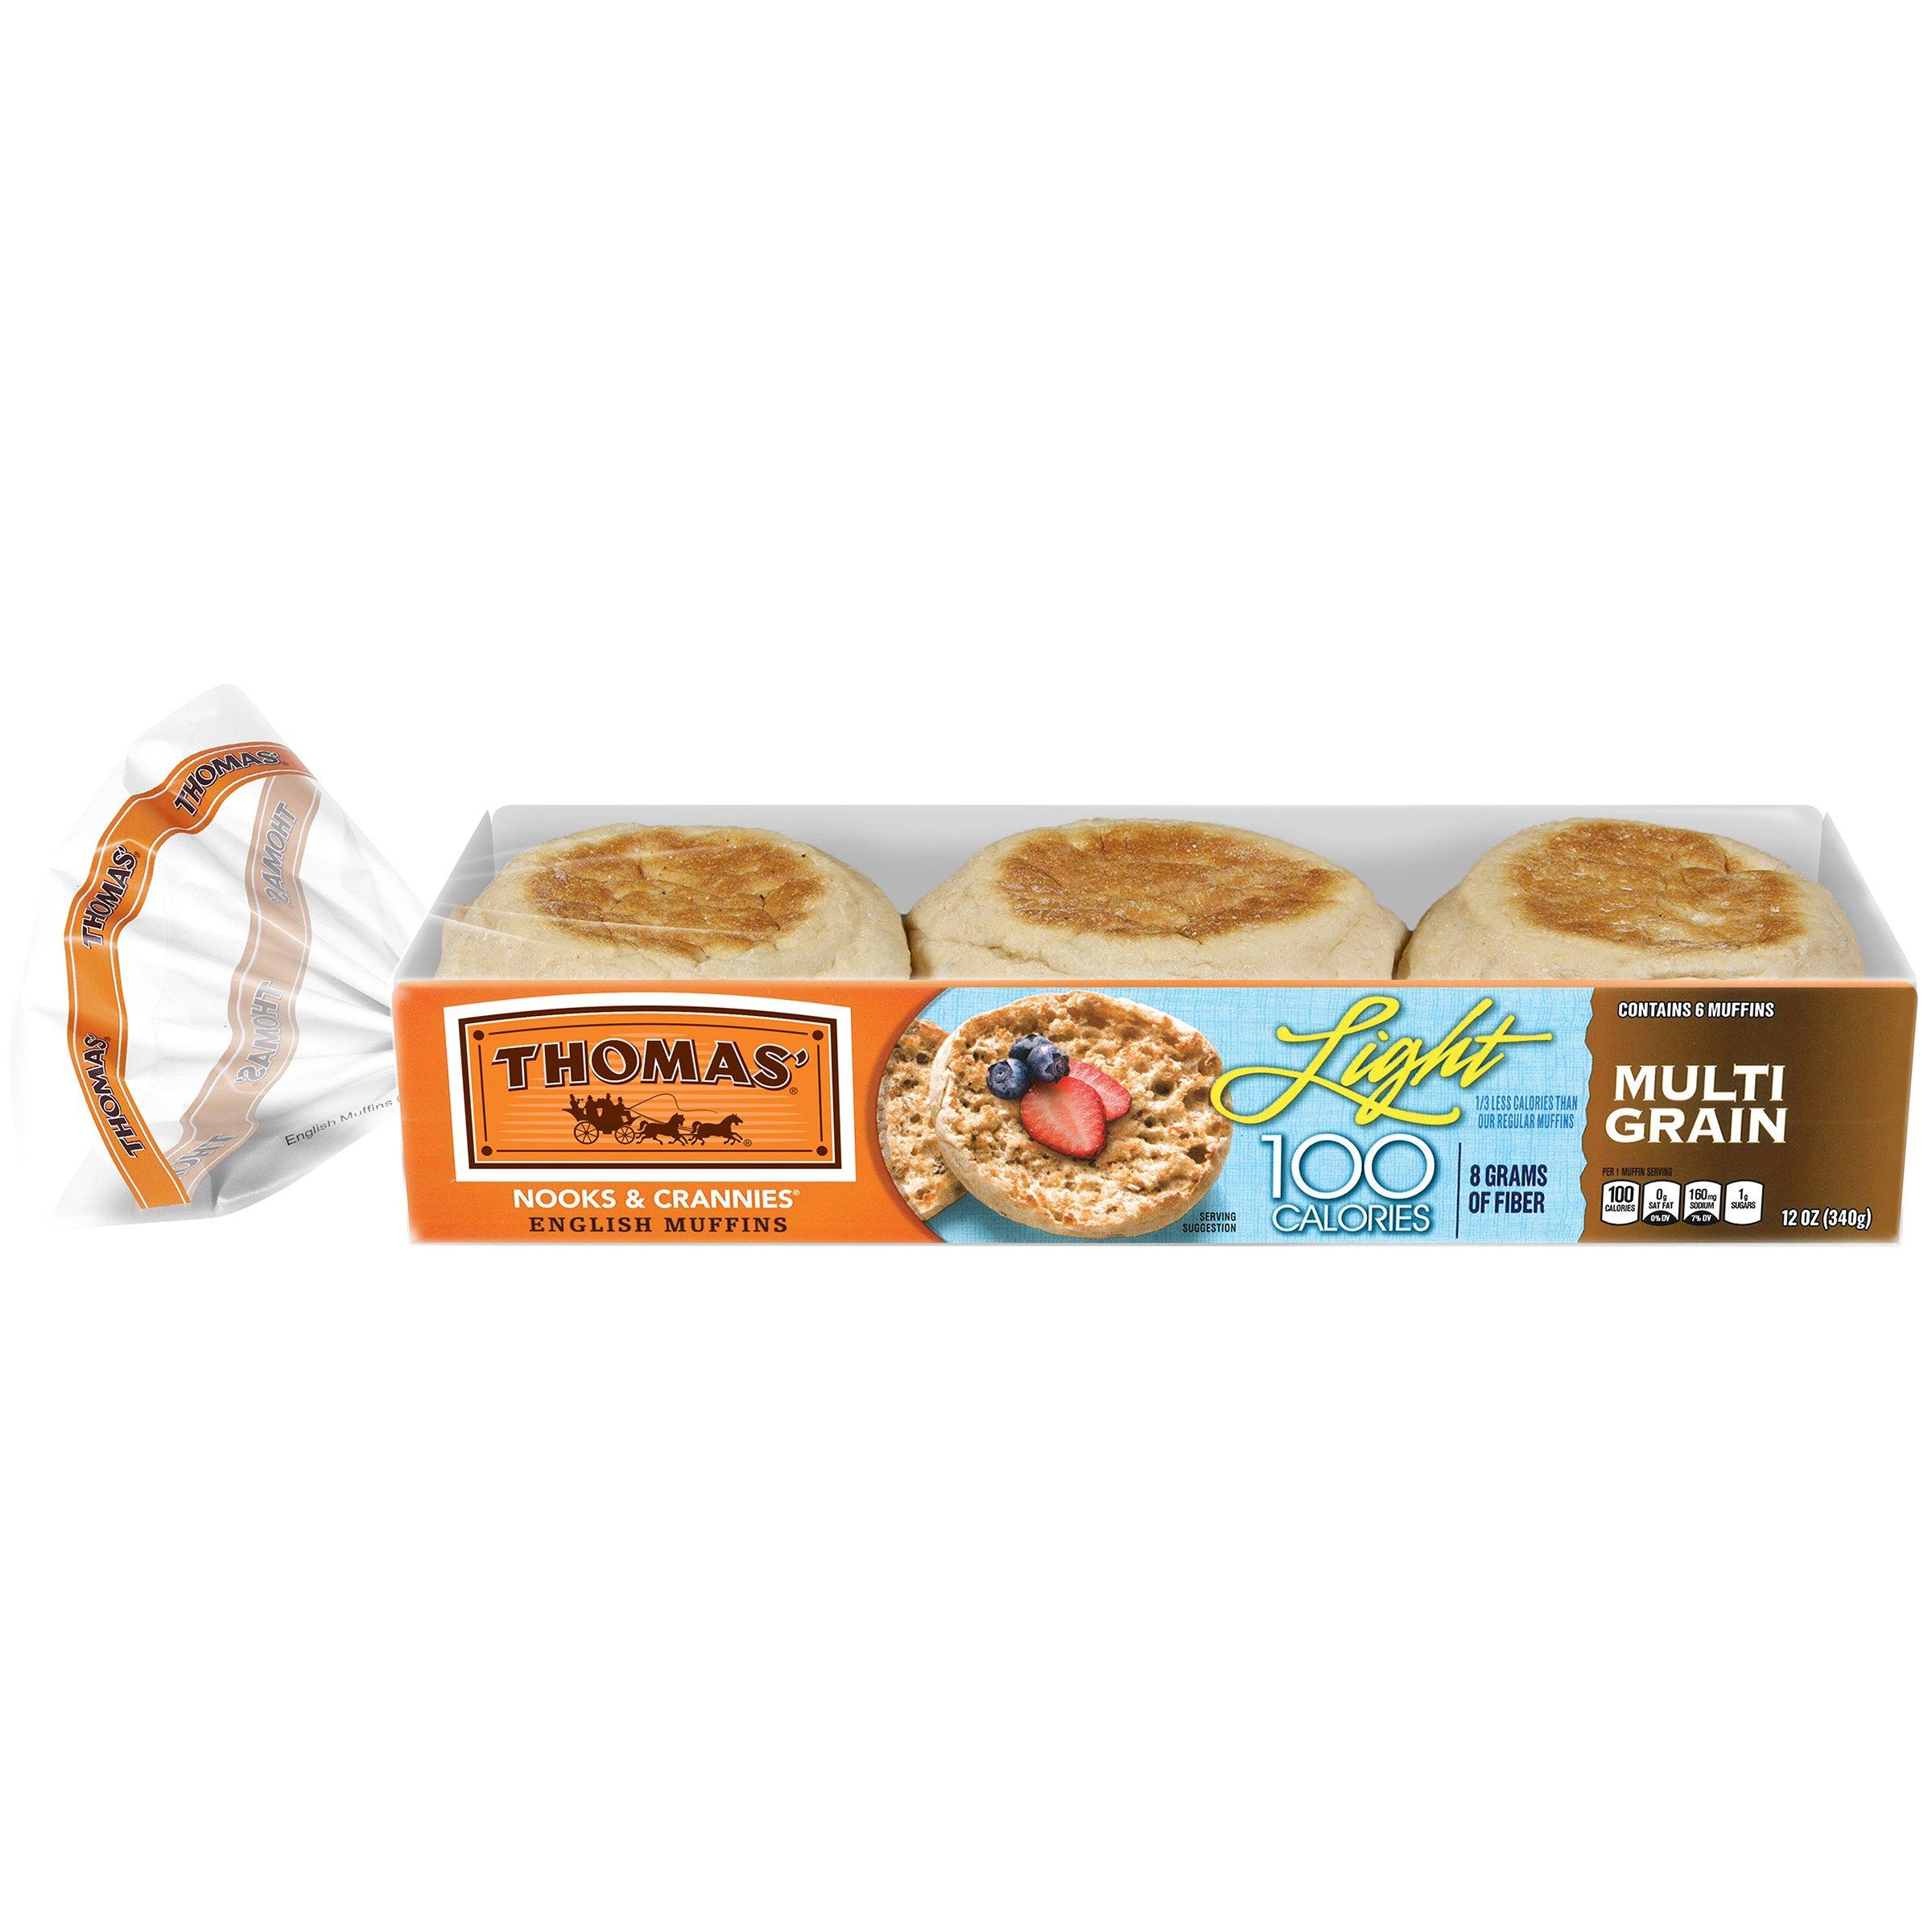 Thomas Light Multi Grain English Muffins Shop Bread At H E B